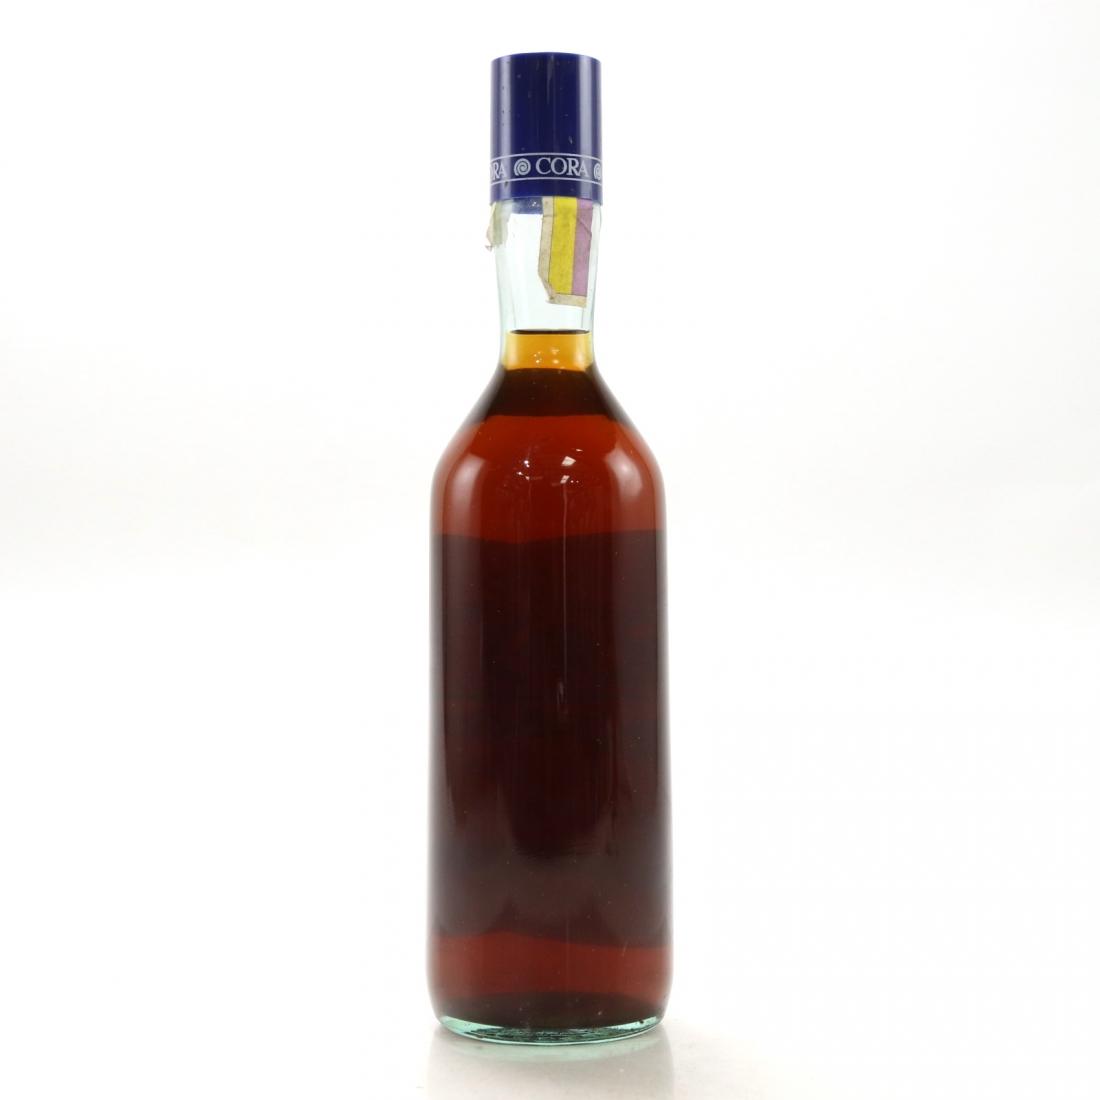 Cora Bianco Vermouth 1 Litre